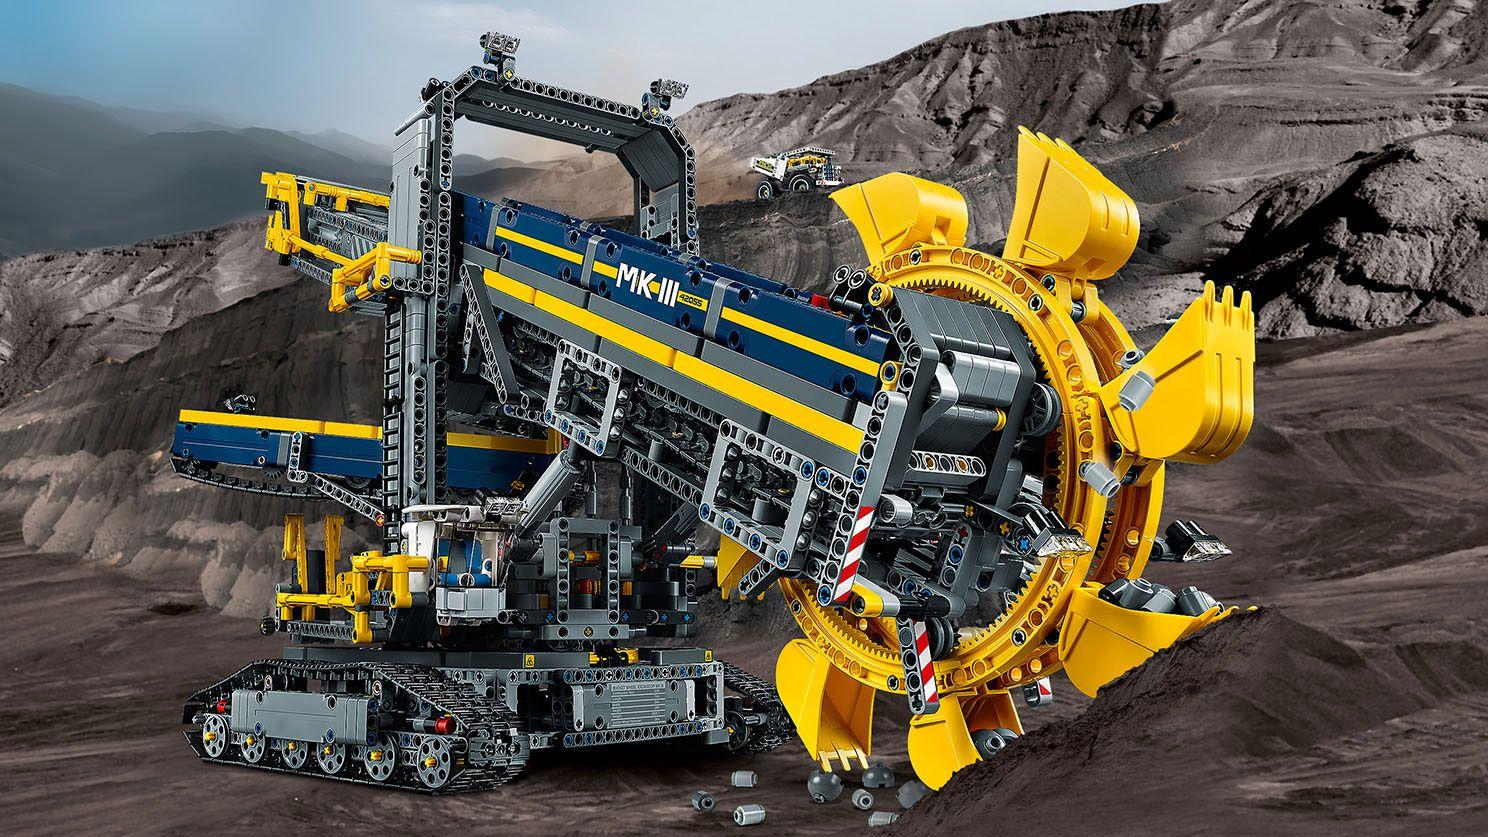 Emmerwiel Graafmachine 42055 Technic Officiele Lego Winkel Be Big Lego Lego Technic Sets Lego Technic